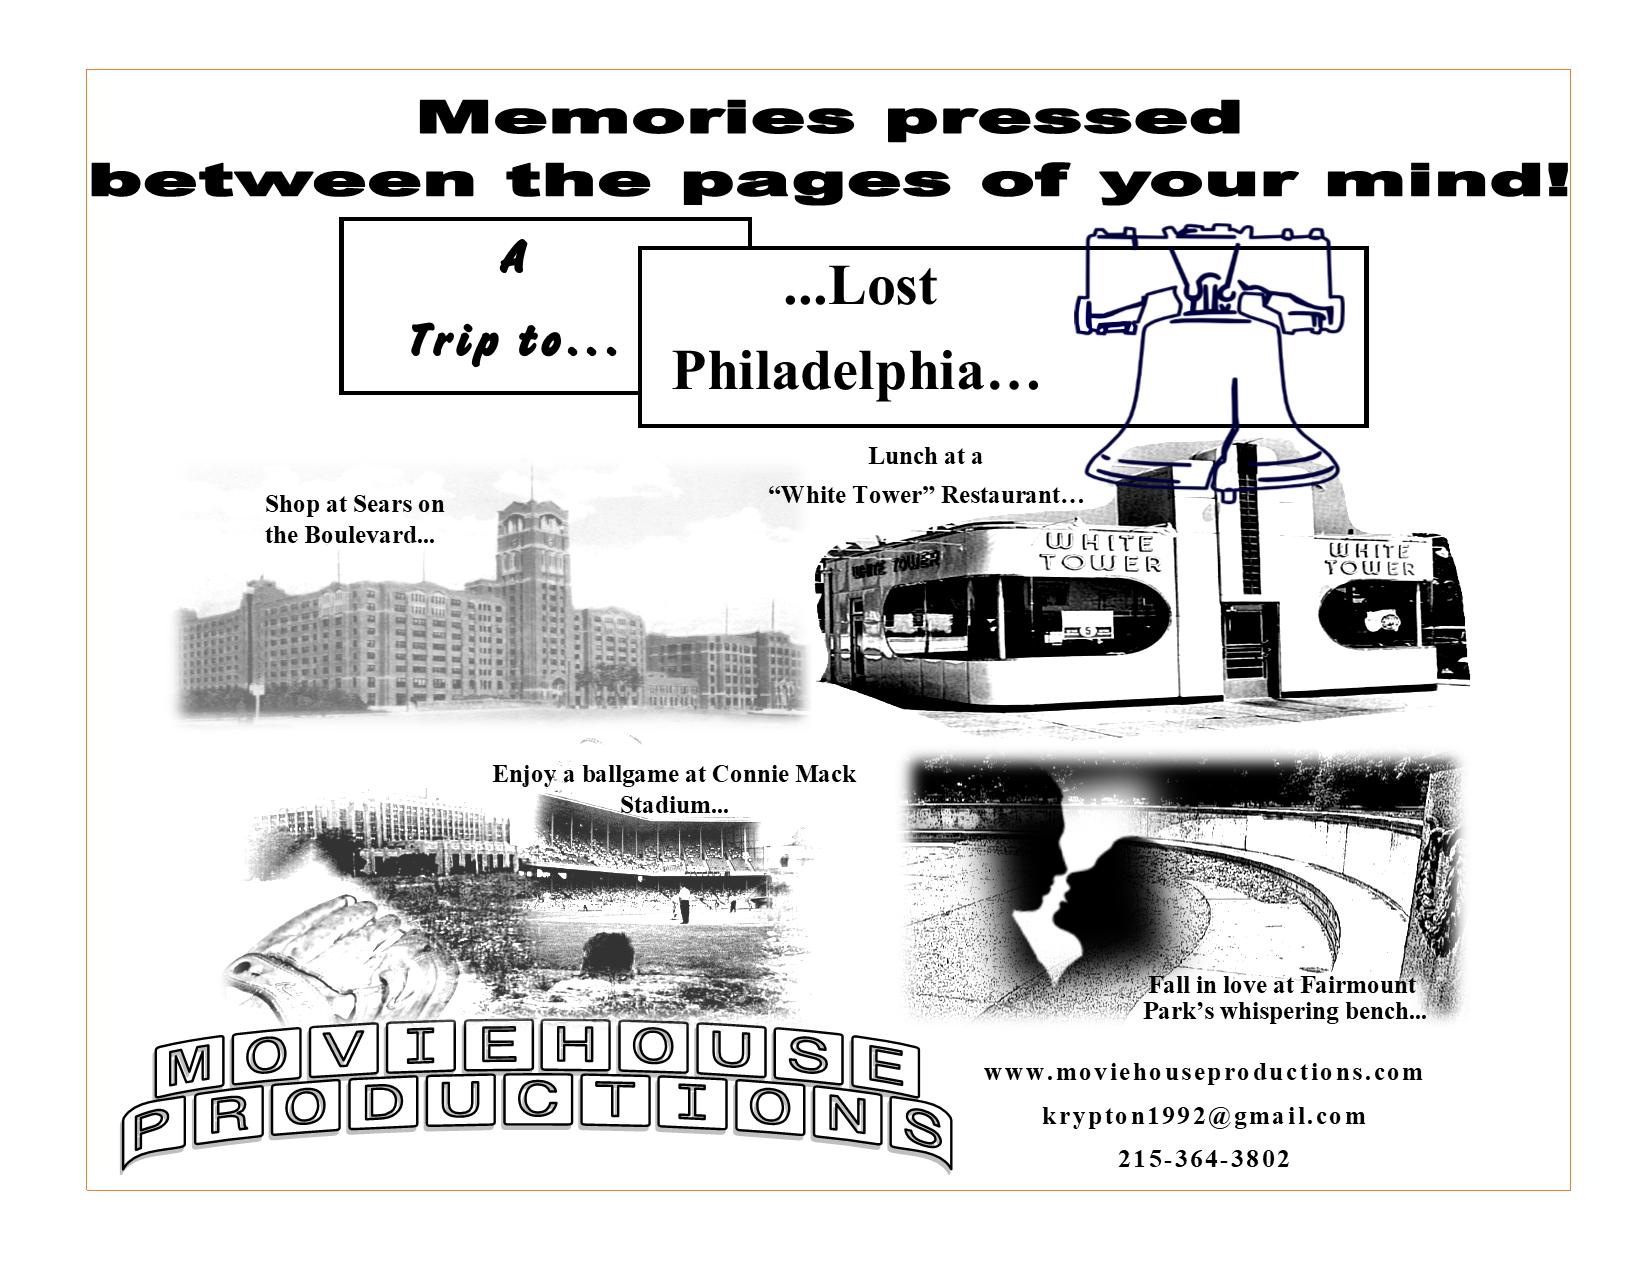 trip to lost Philadelphia